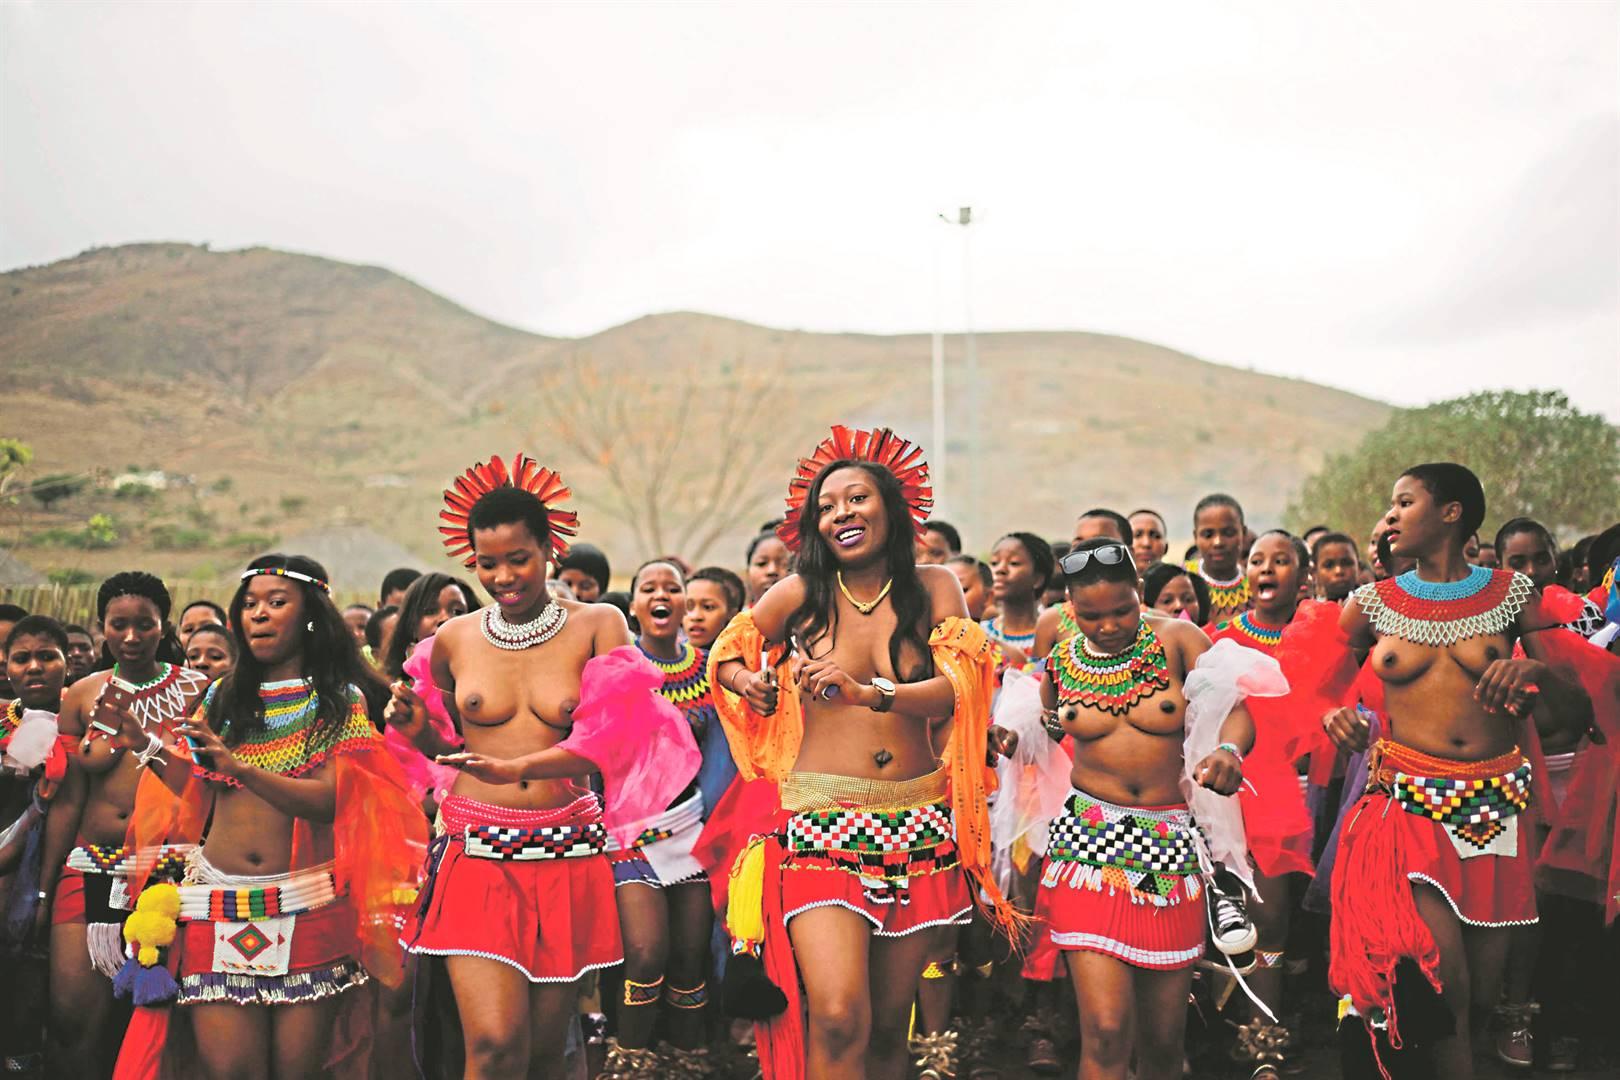 Zulu maidens at a reed dance at Enyokeni Royal Palace in Nongoma, Zululand. Photo: Tebogo Letsie